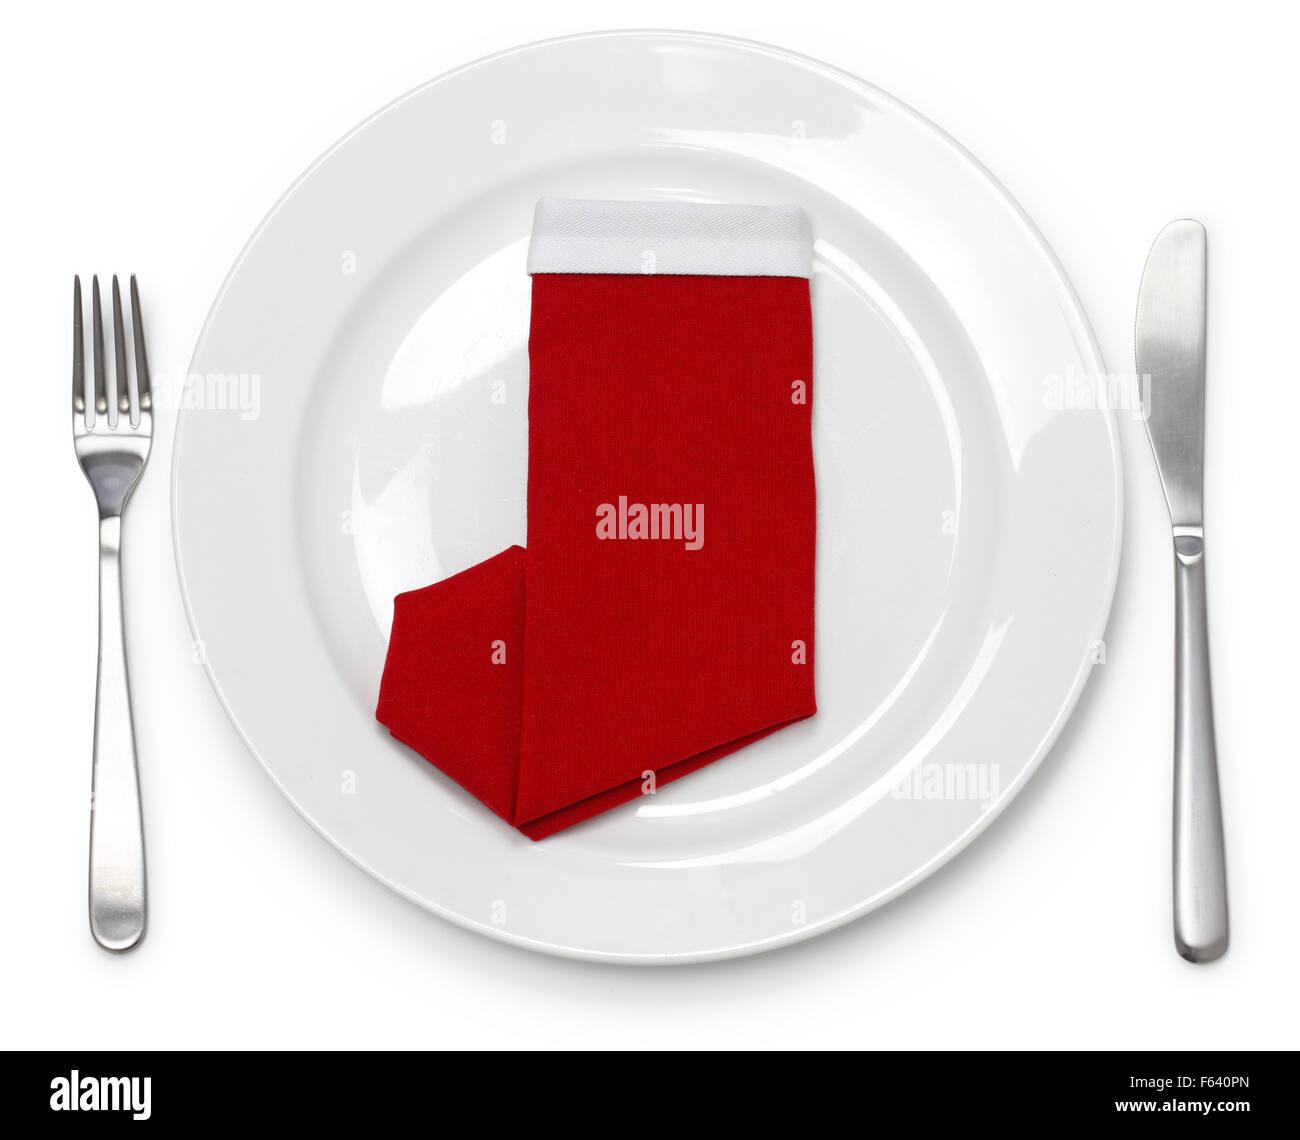 Christmas Dinner Table Setting Napkin Folded As A Santa Claus Boots Stock Photo Alamy